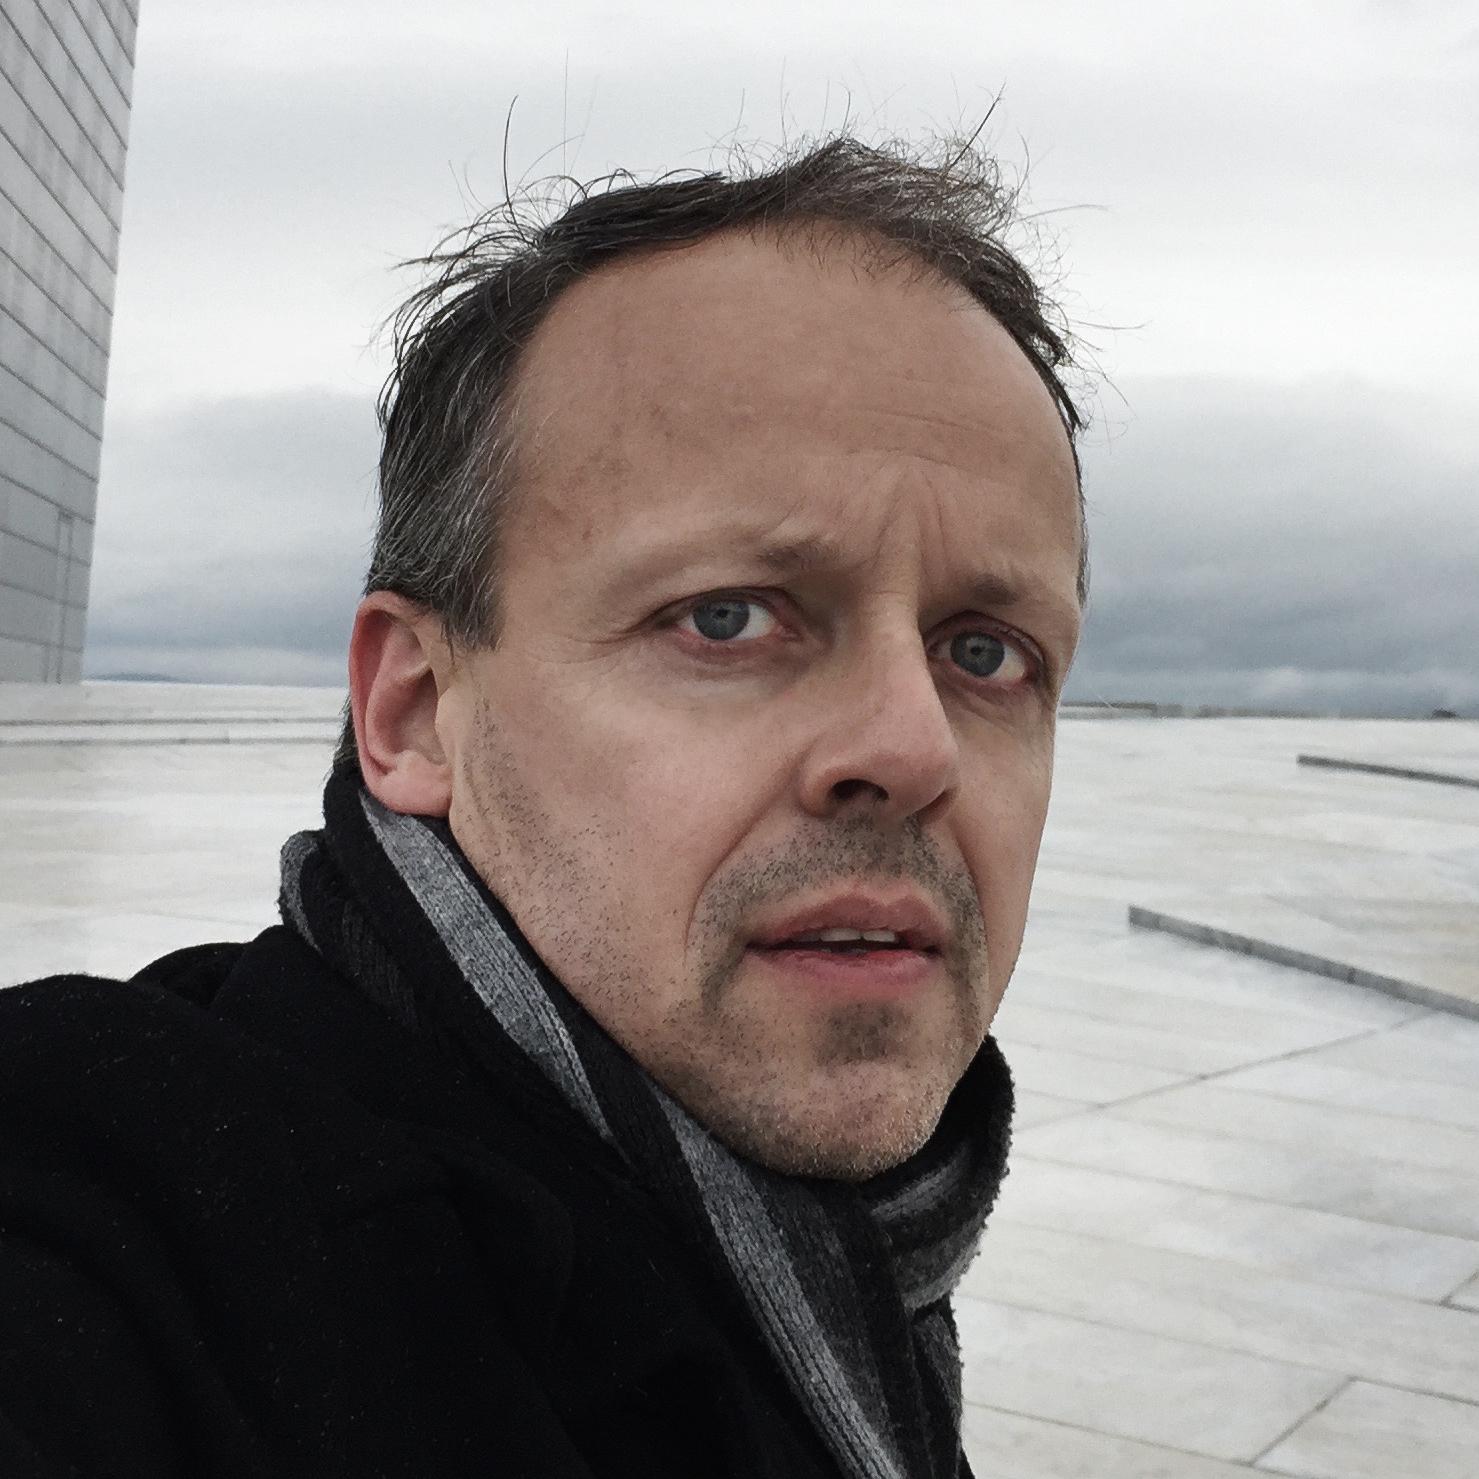 Thomas Munkholt